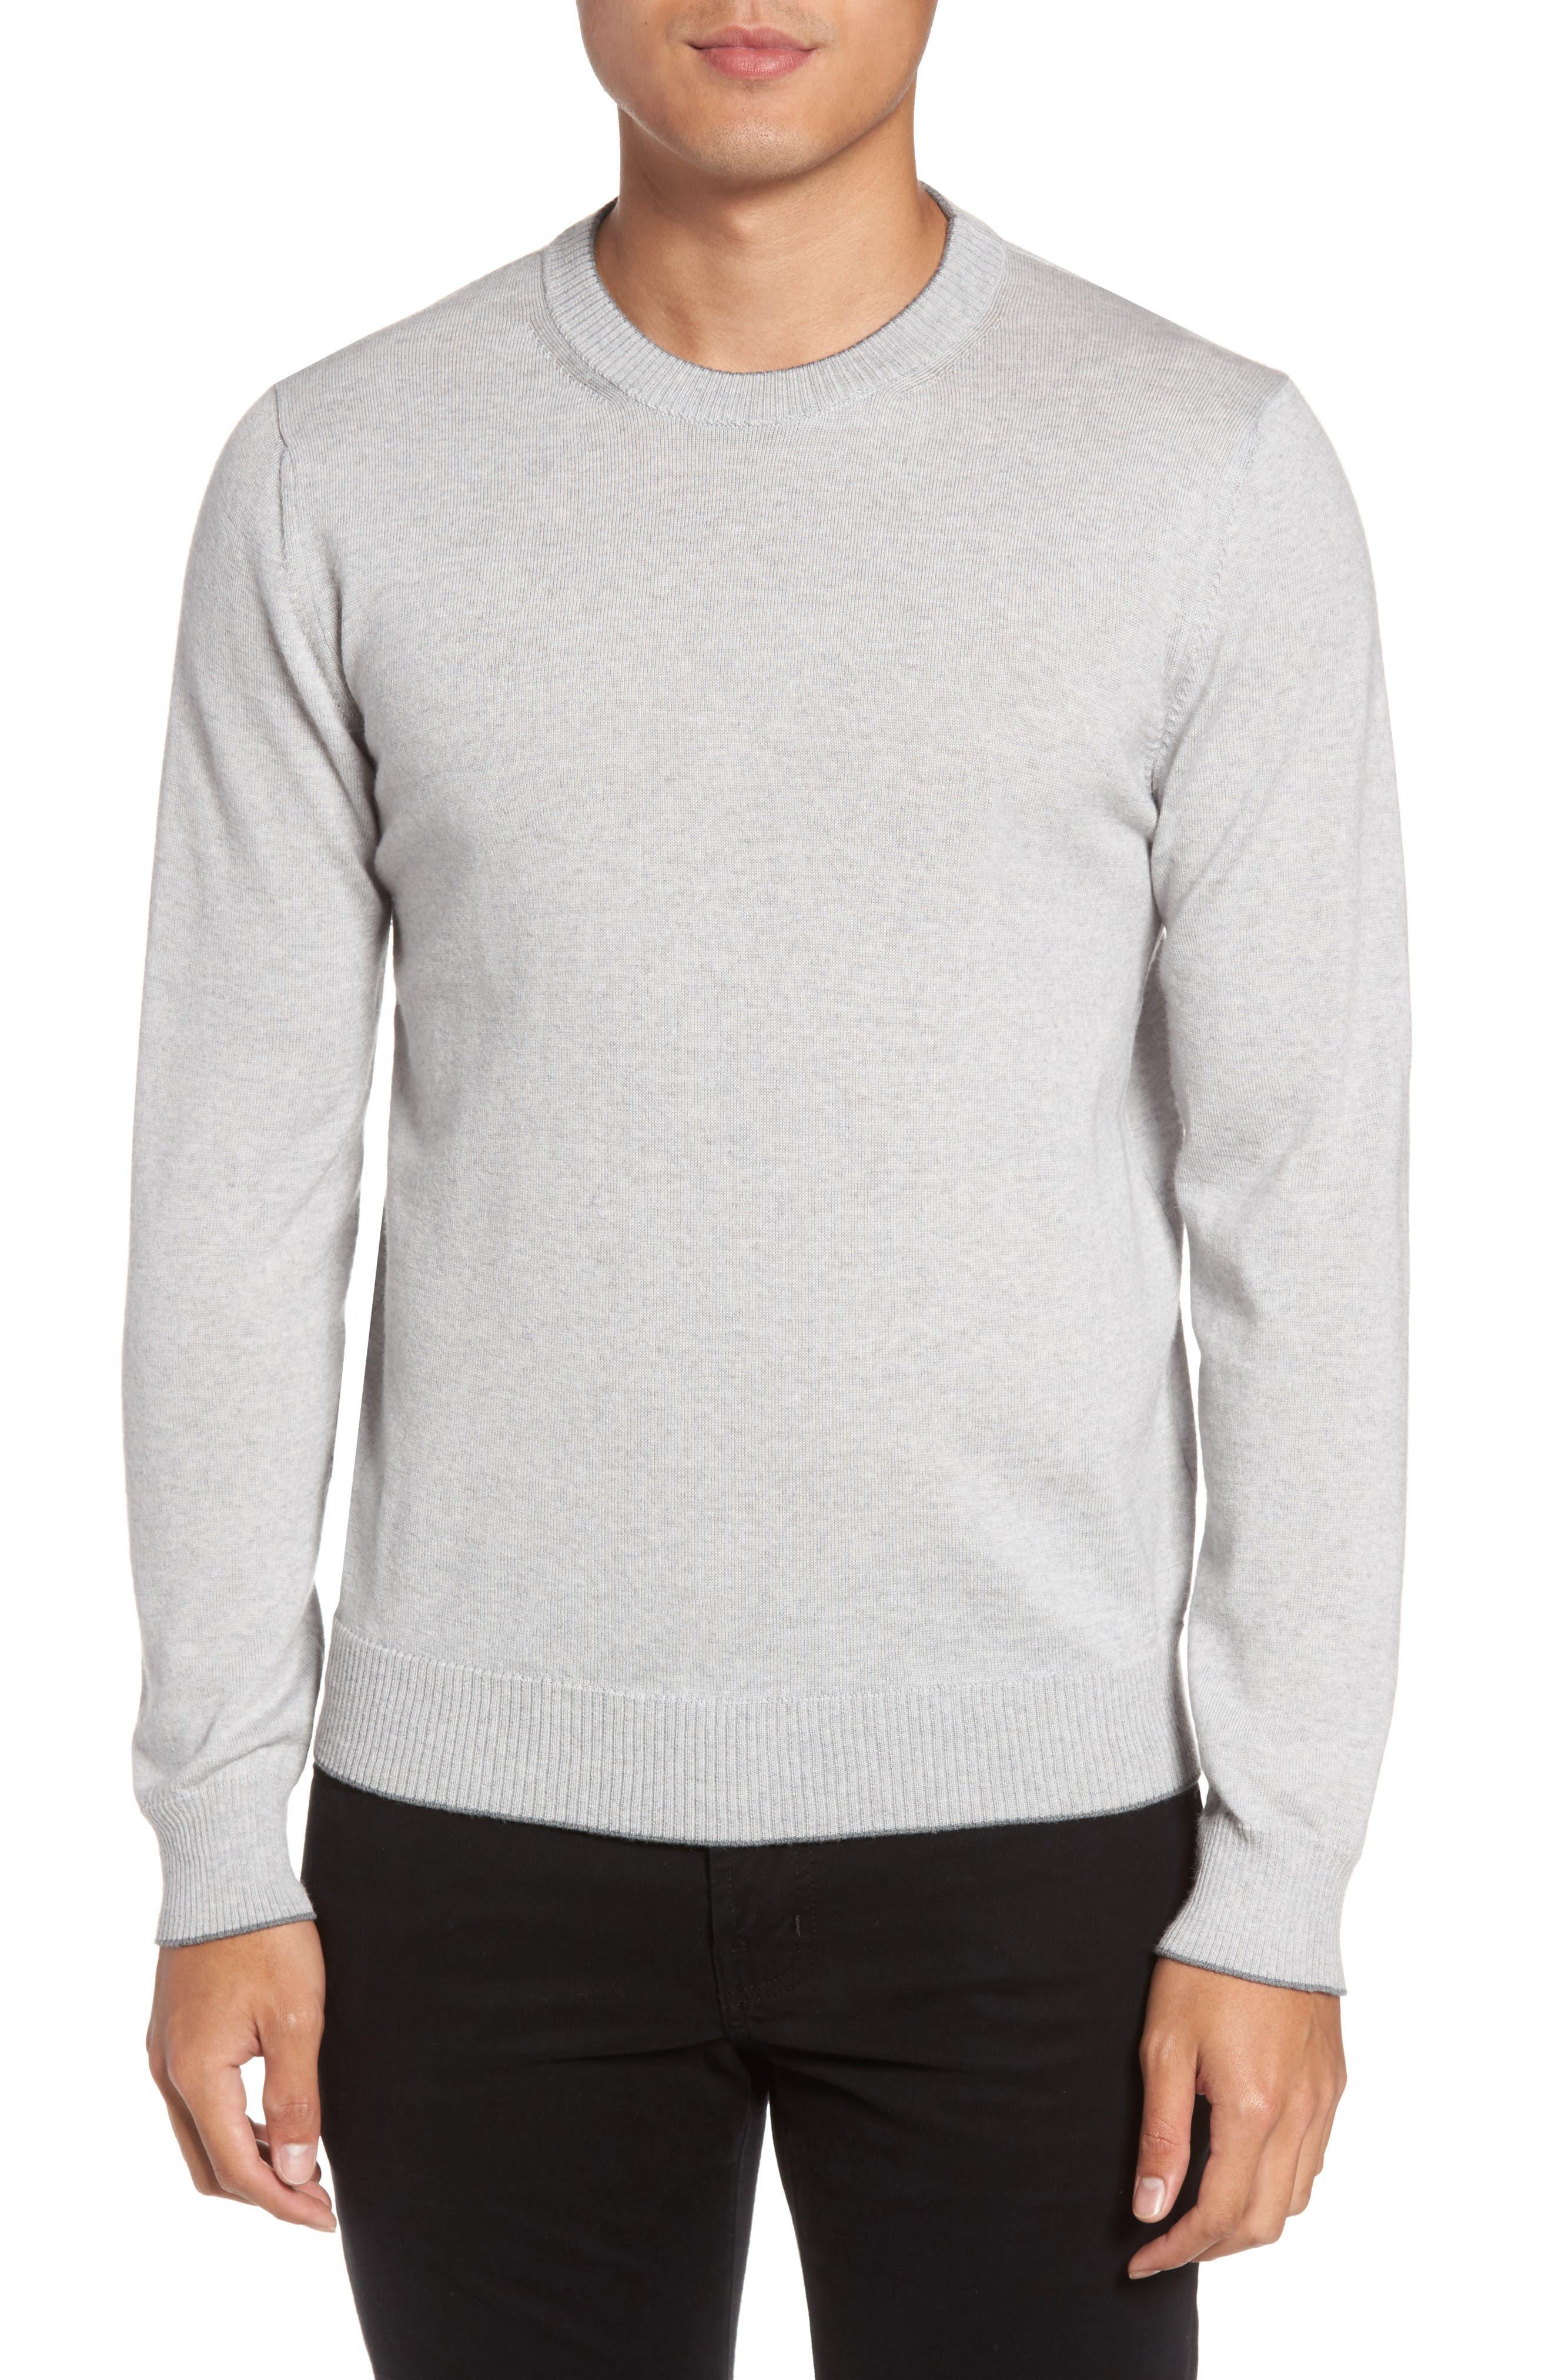 Virgin Wool Crewneck Sweater,                         Main,                         color, Light Grey